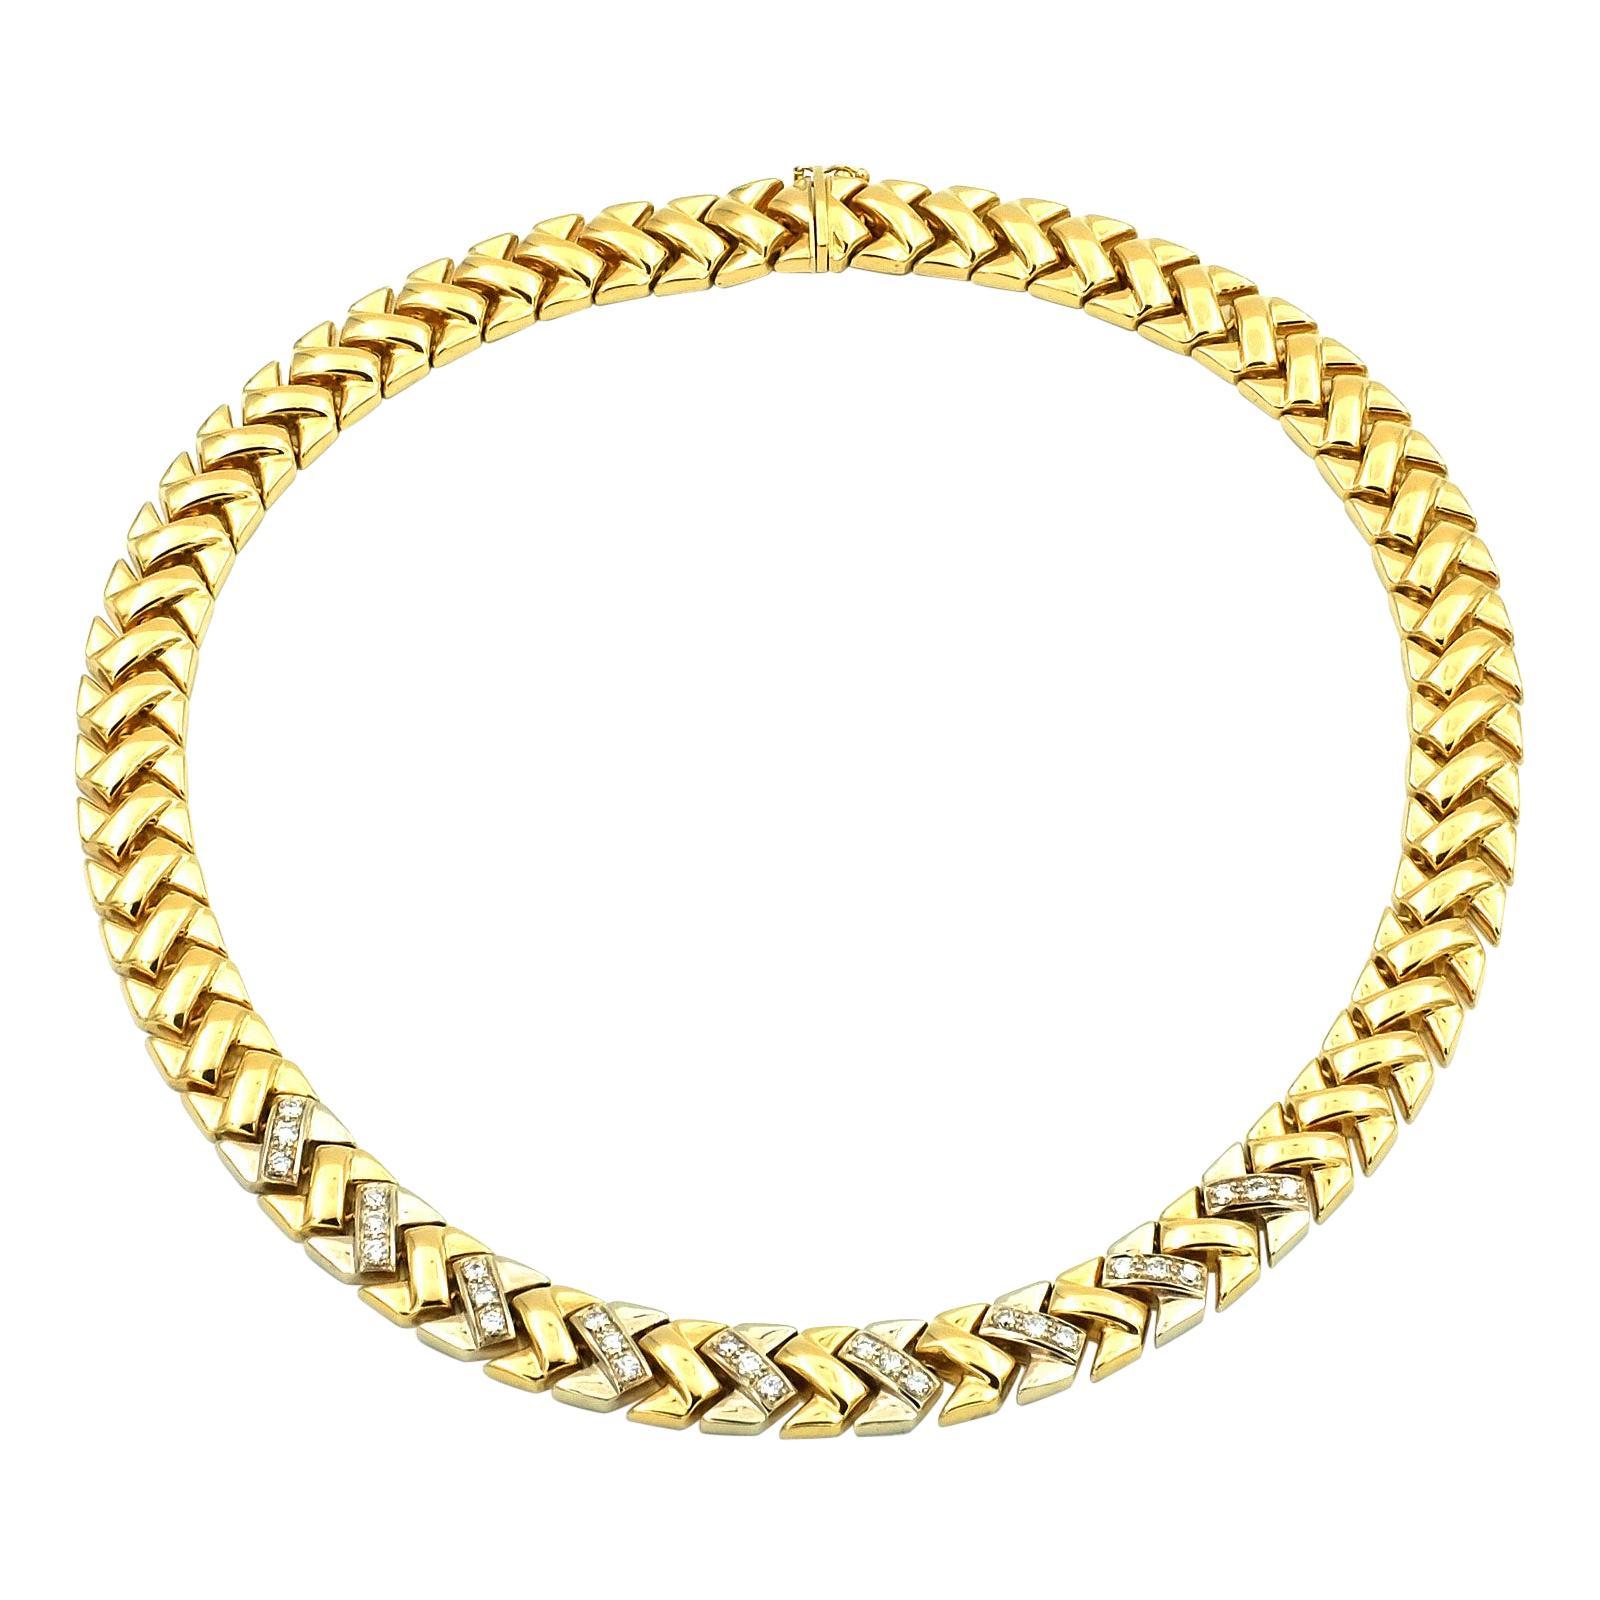 1 Carat Diamond 18K Gold Choker Necklace